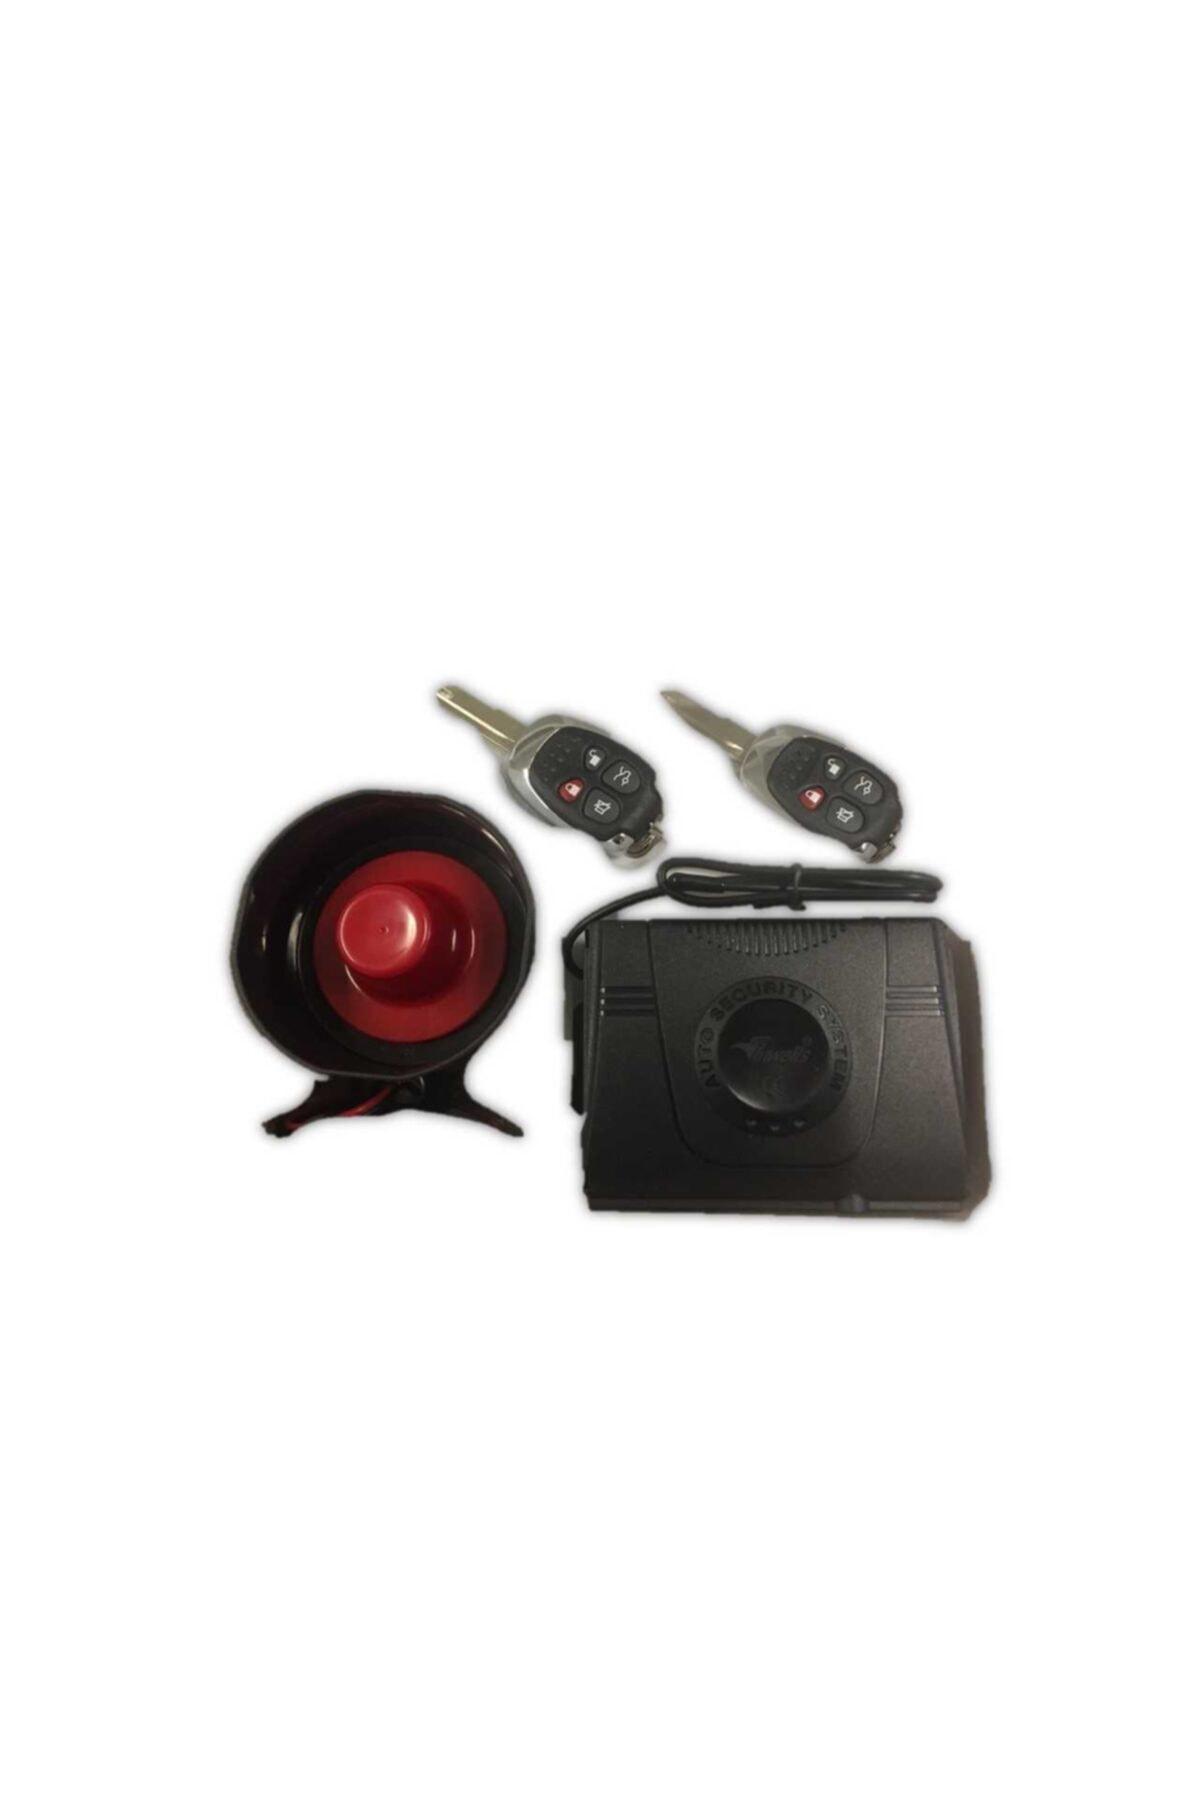 Inwells Oto Alarmı Komple Set 12v Kumanda Modeli: 3323 1